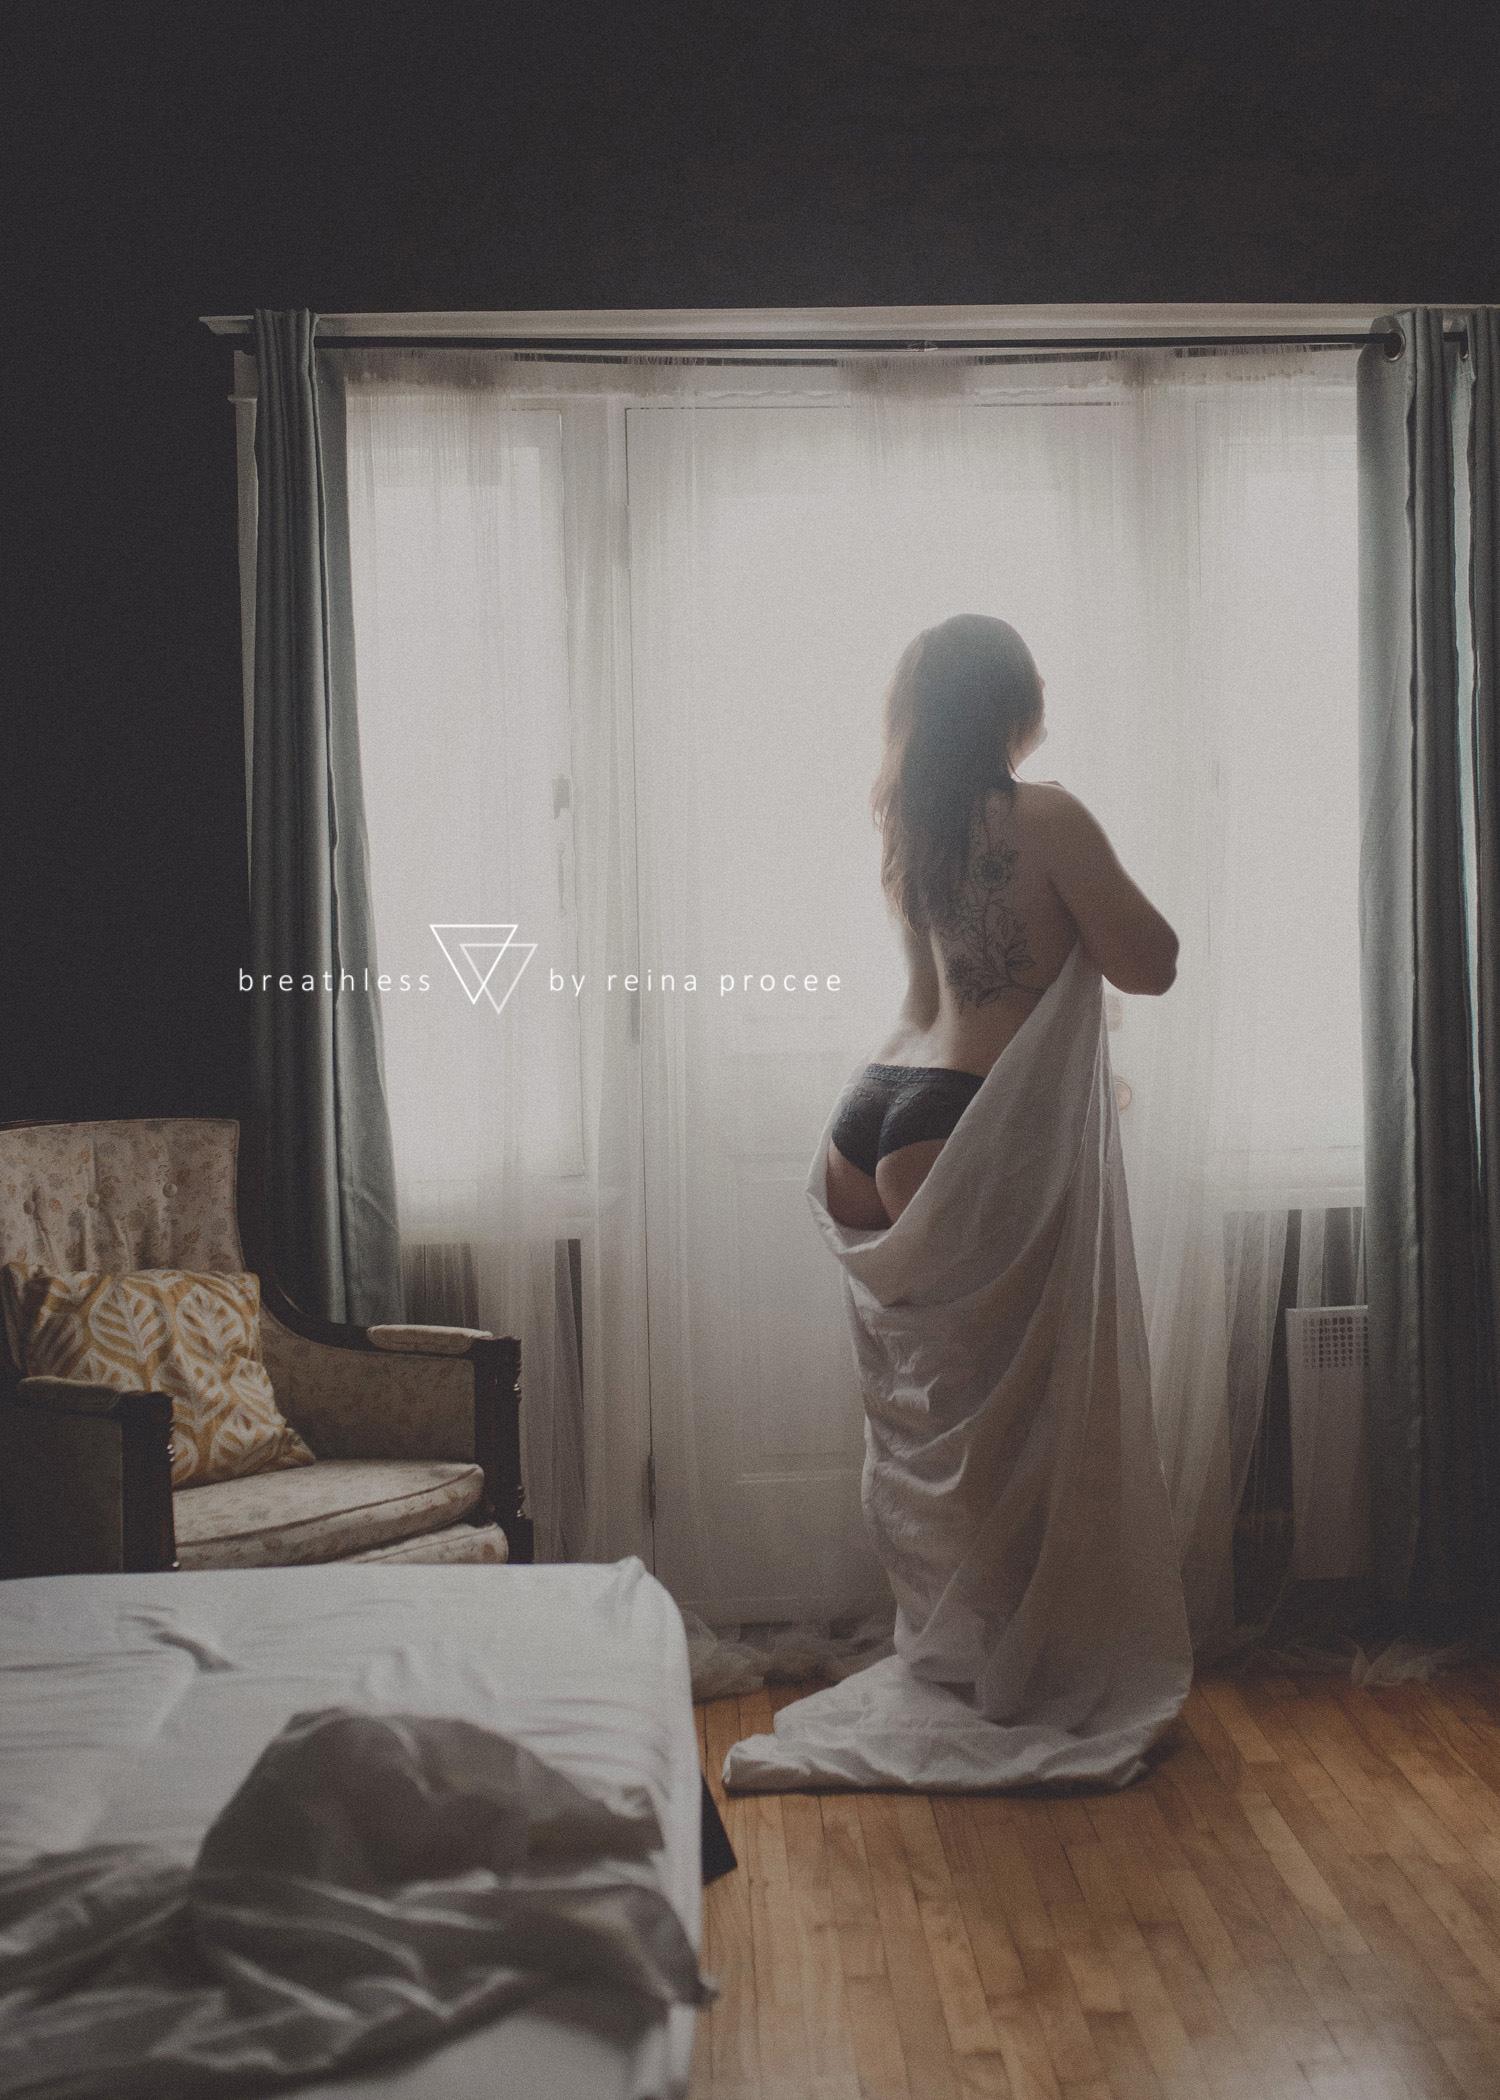 016-boudoir-photographer-montreal-breathless-best-photos.jpg